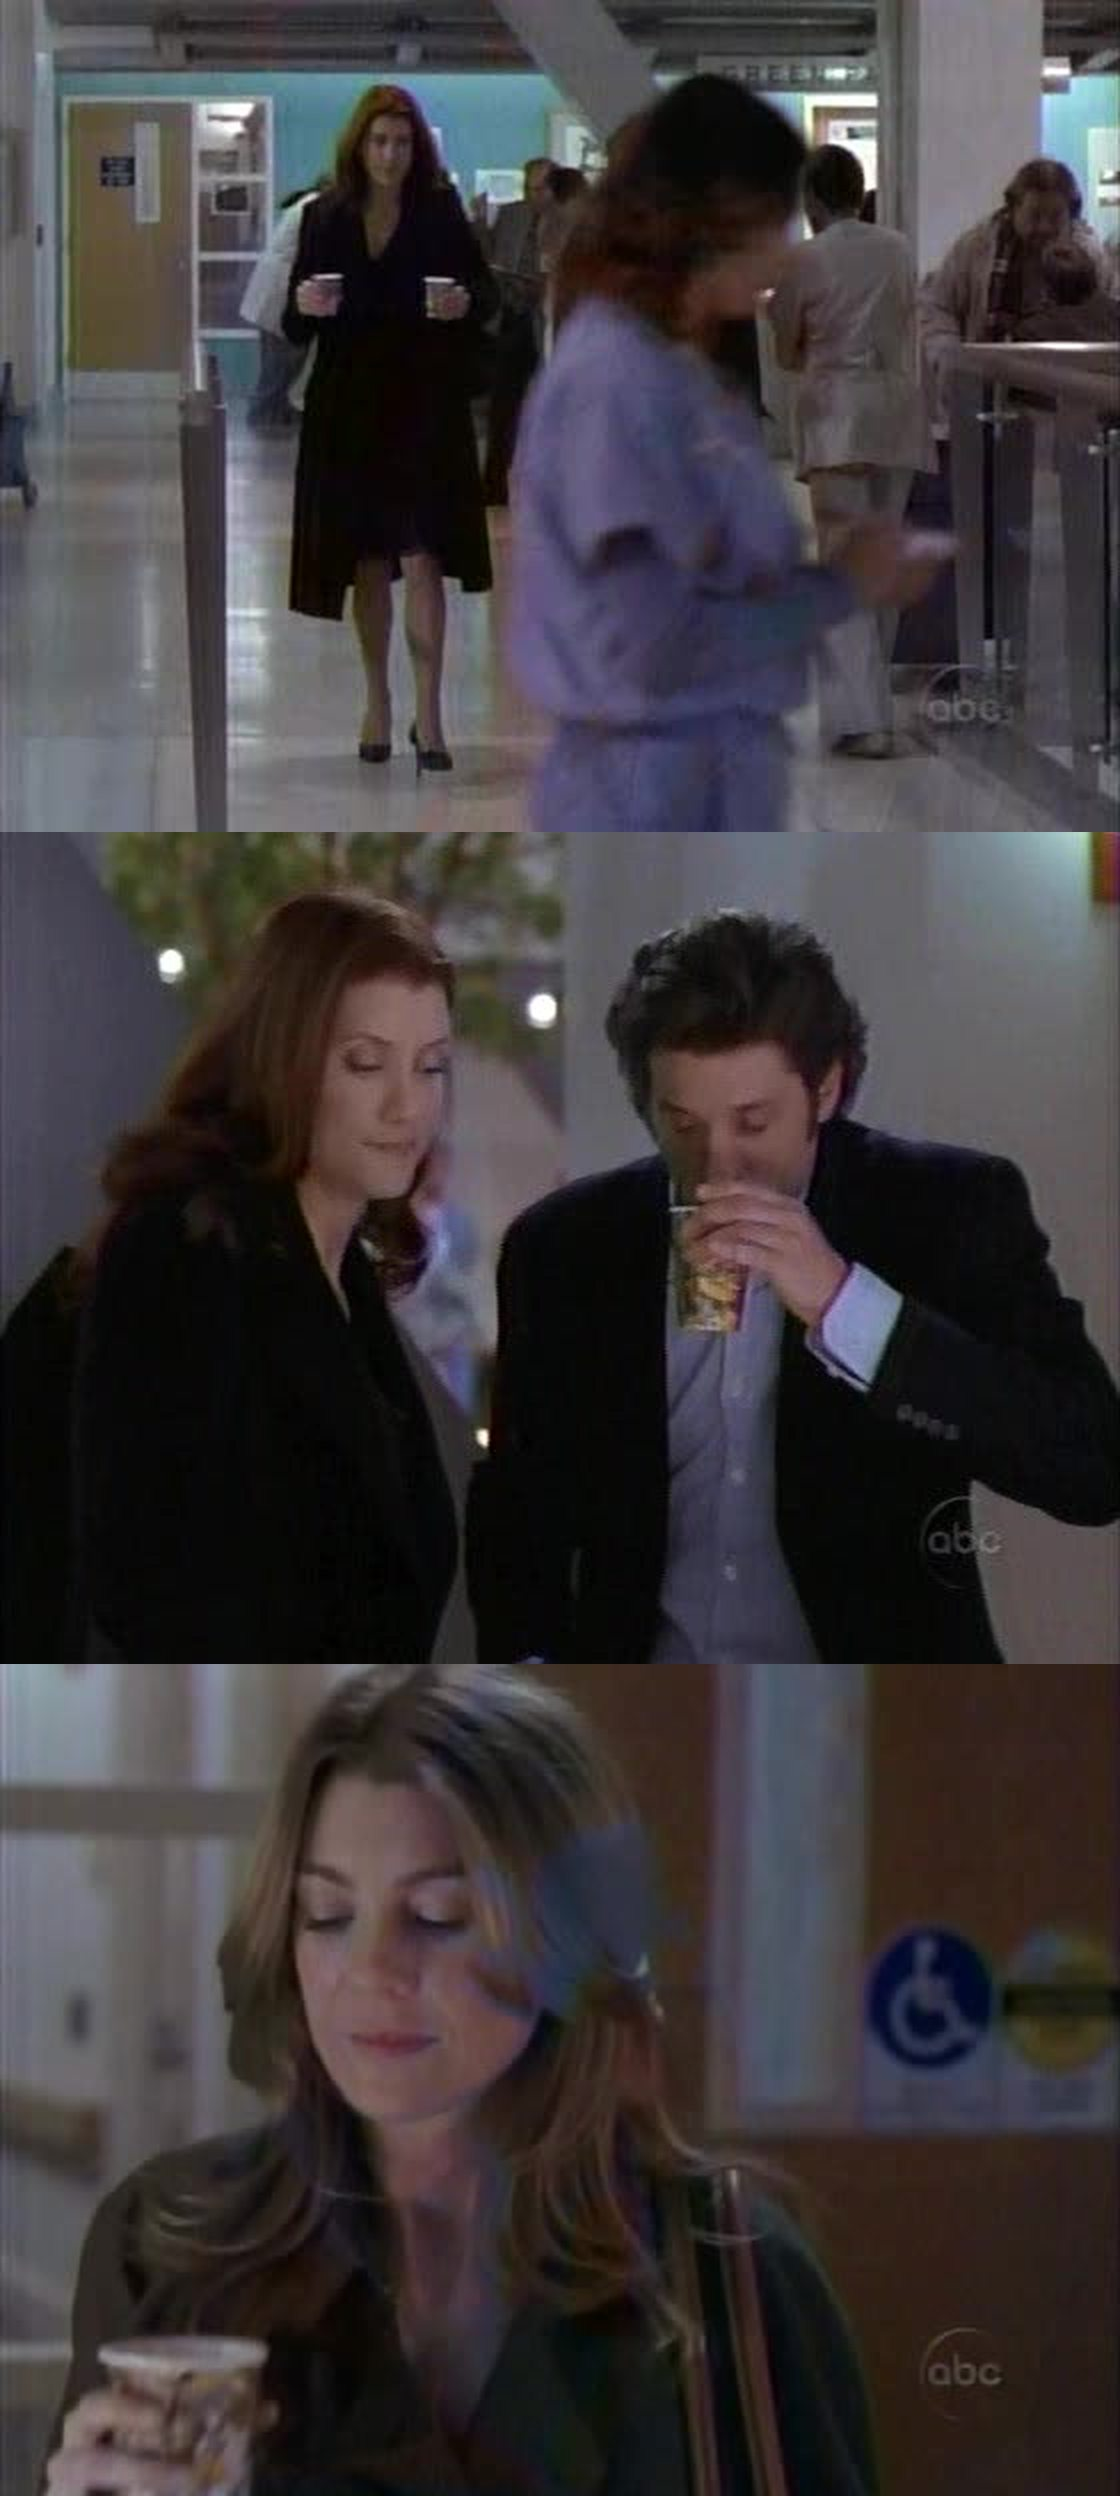 Never refuse hot chocolate